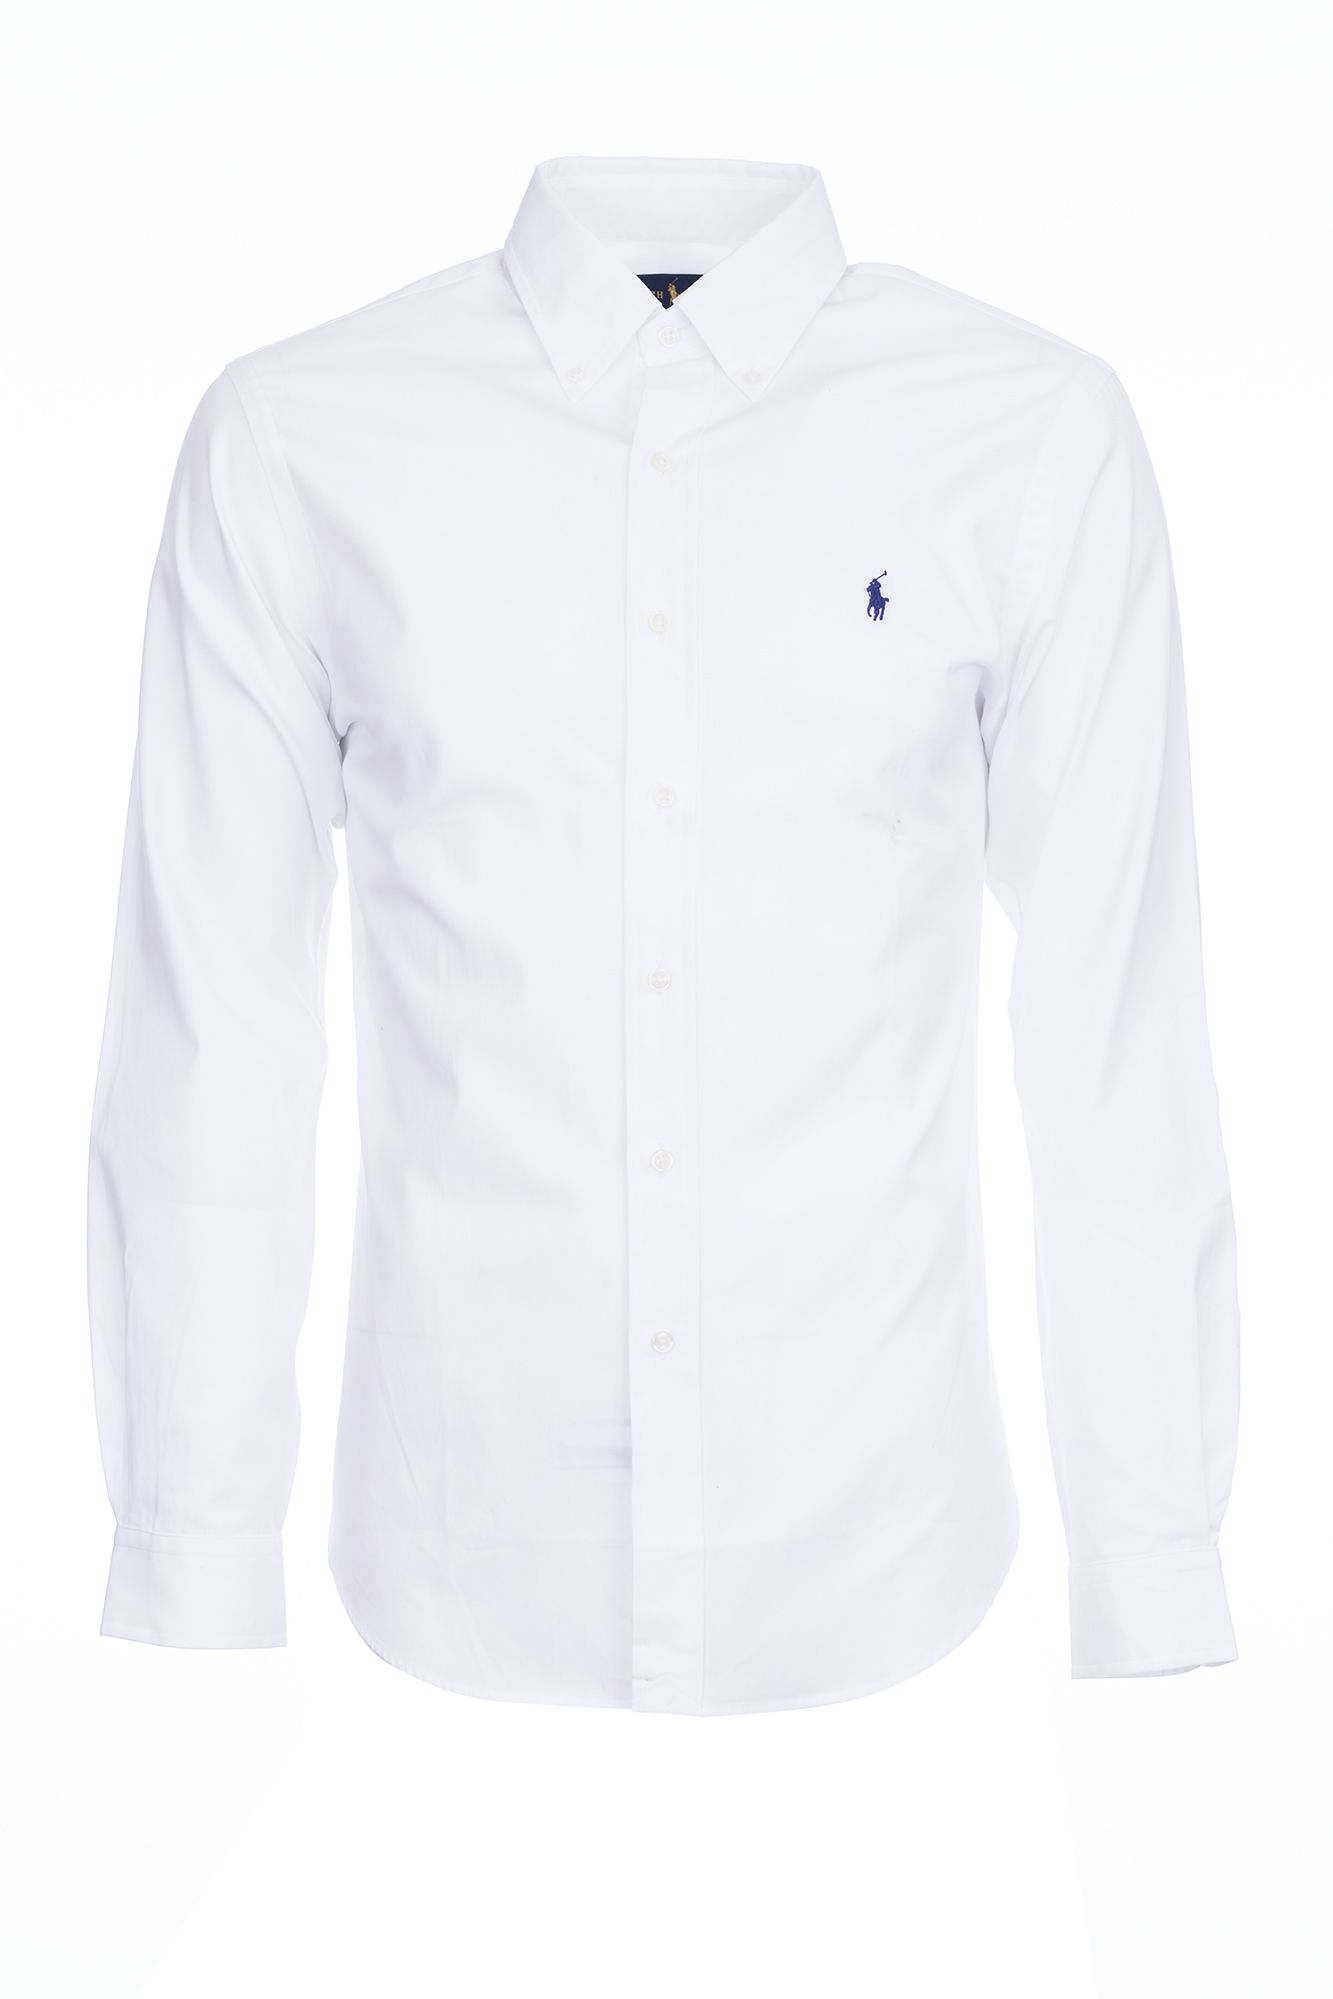 495f10ea3 POLO Ralph Koszula męska biała Slim Fit Logo r XXL - 7194558866 ...